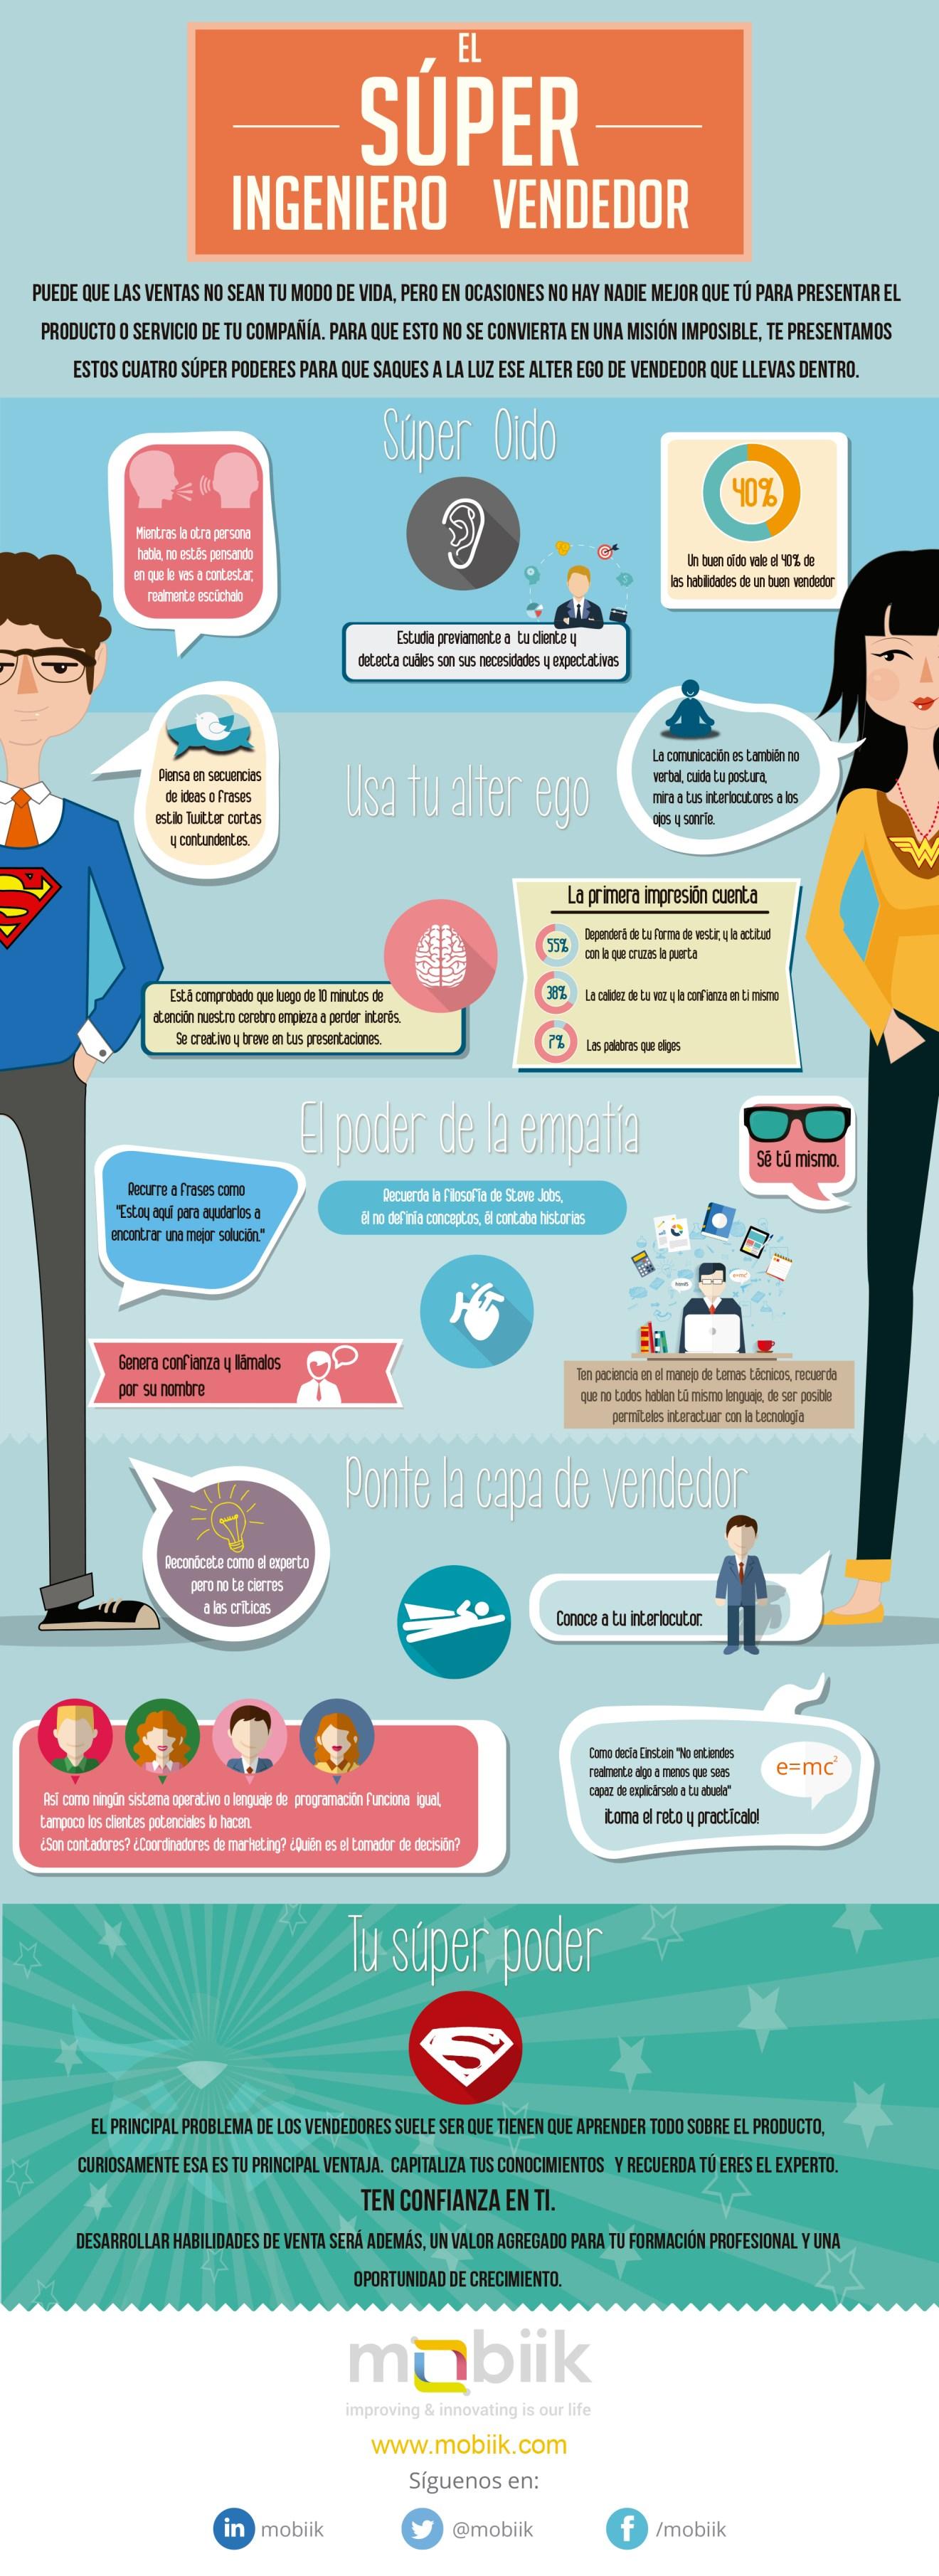 super-ingeniero-vendedor-infografia